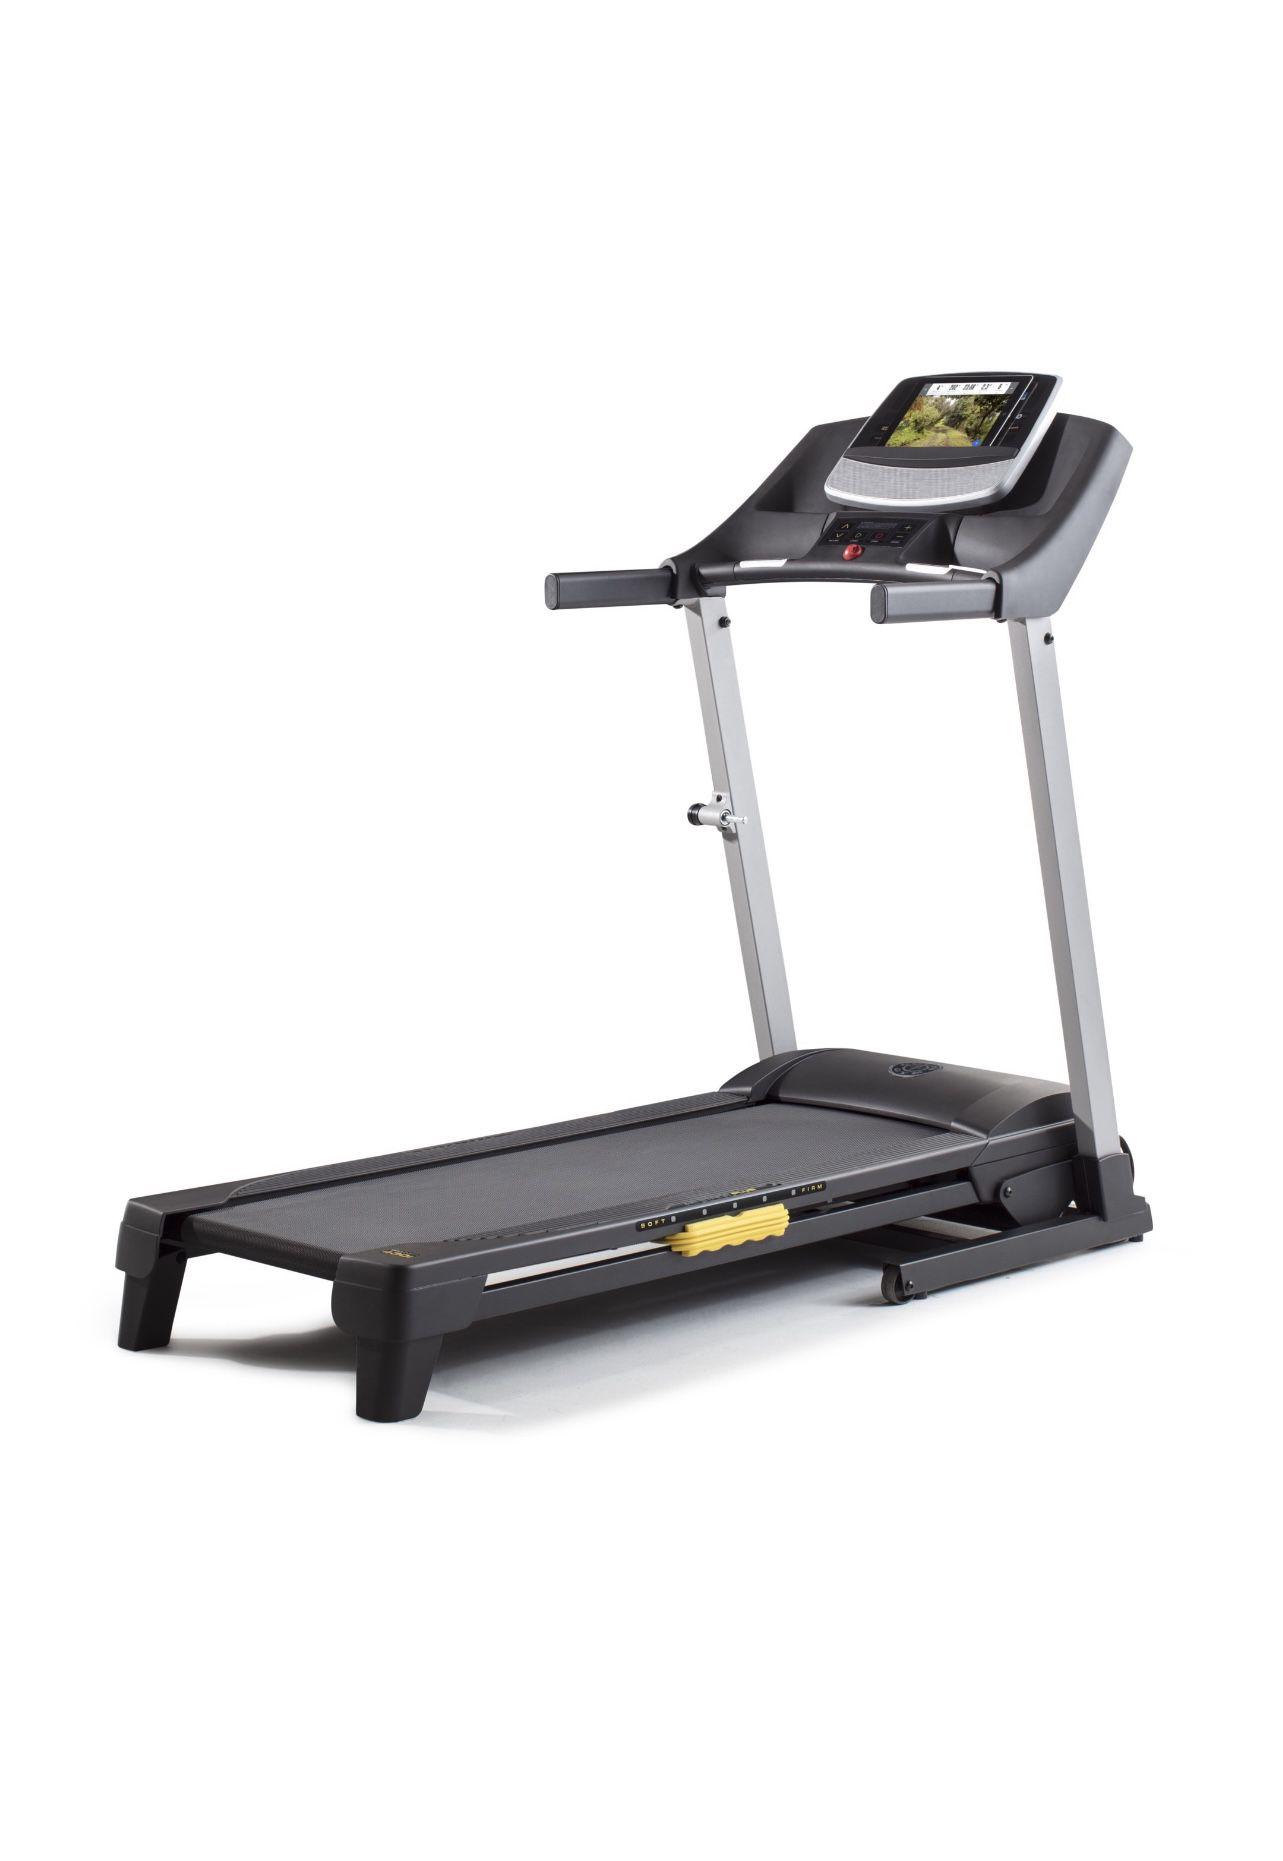 Treadmill ProForm New On Box